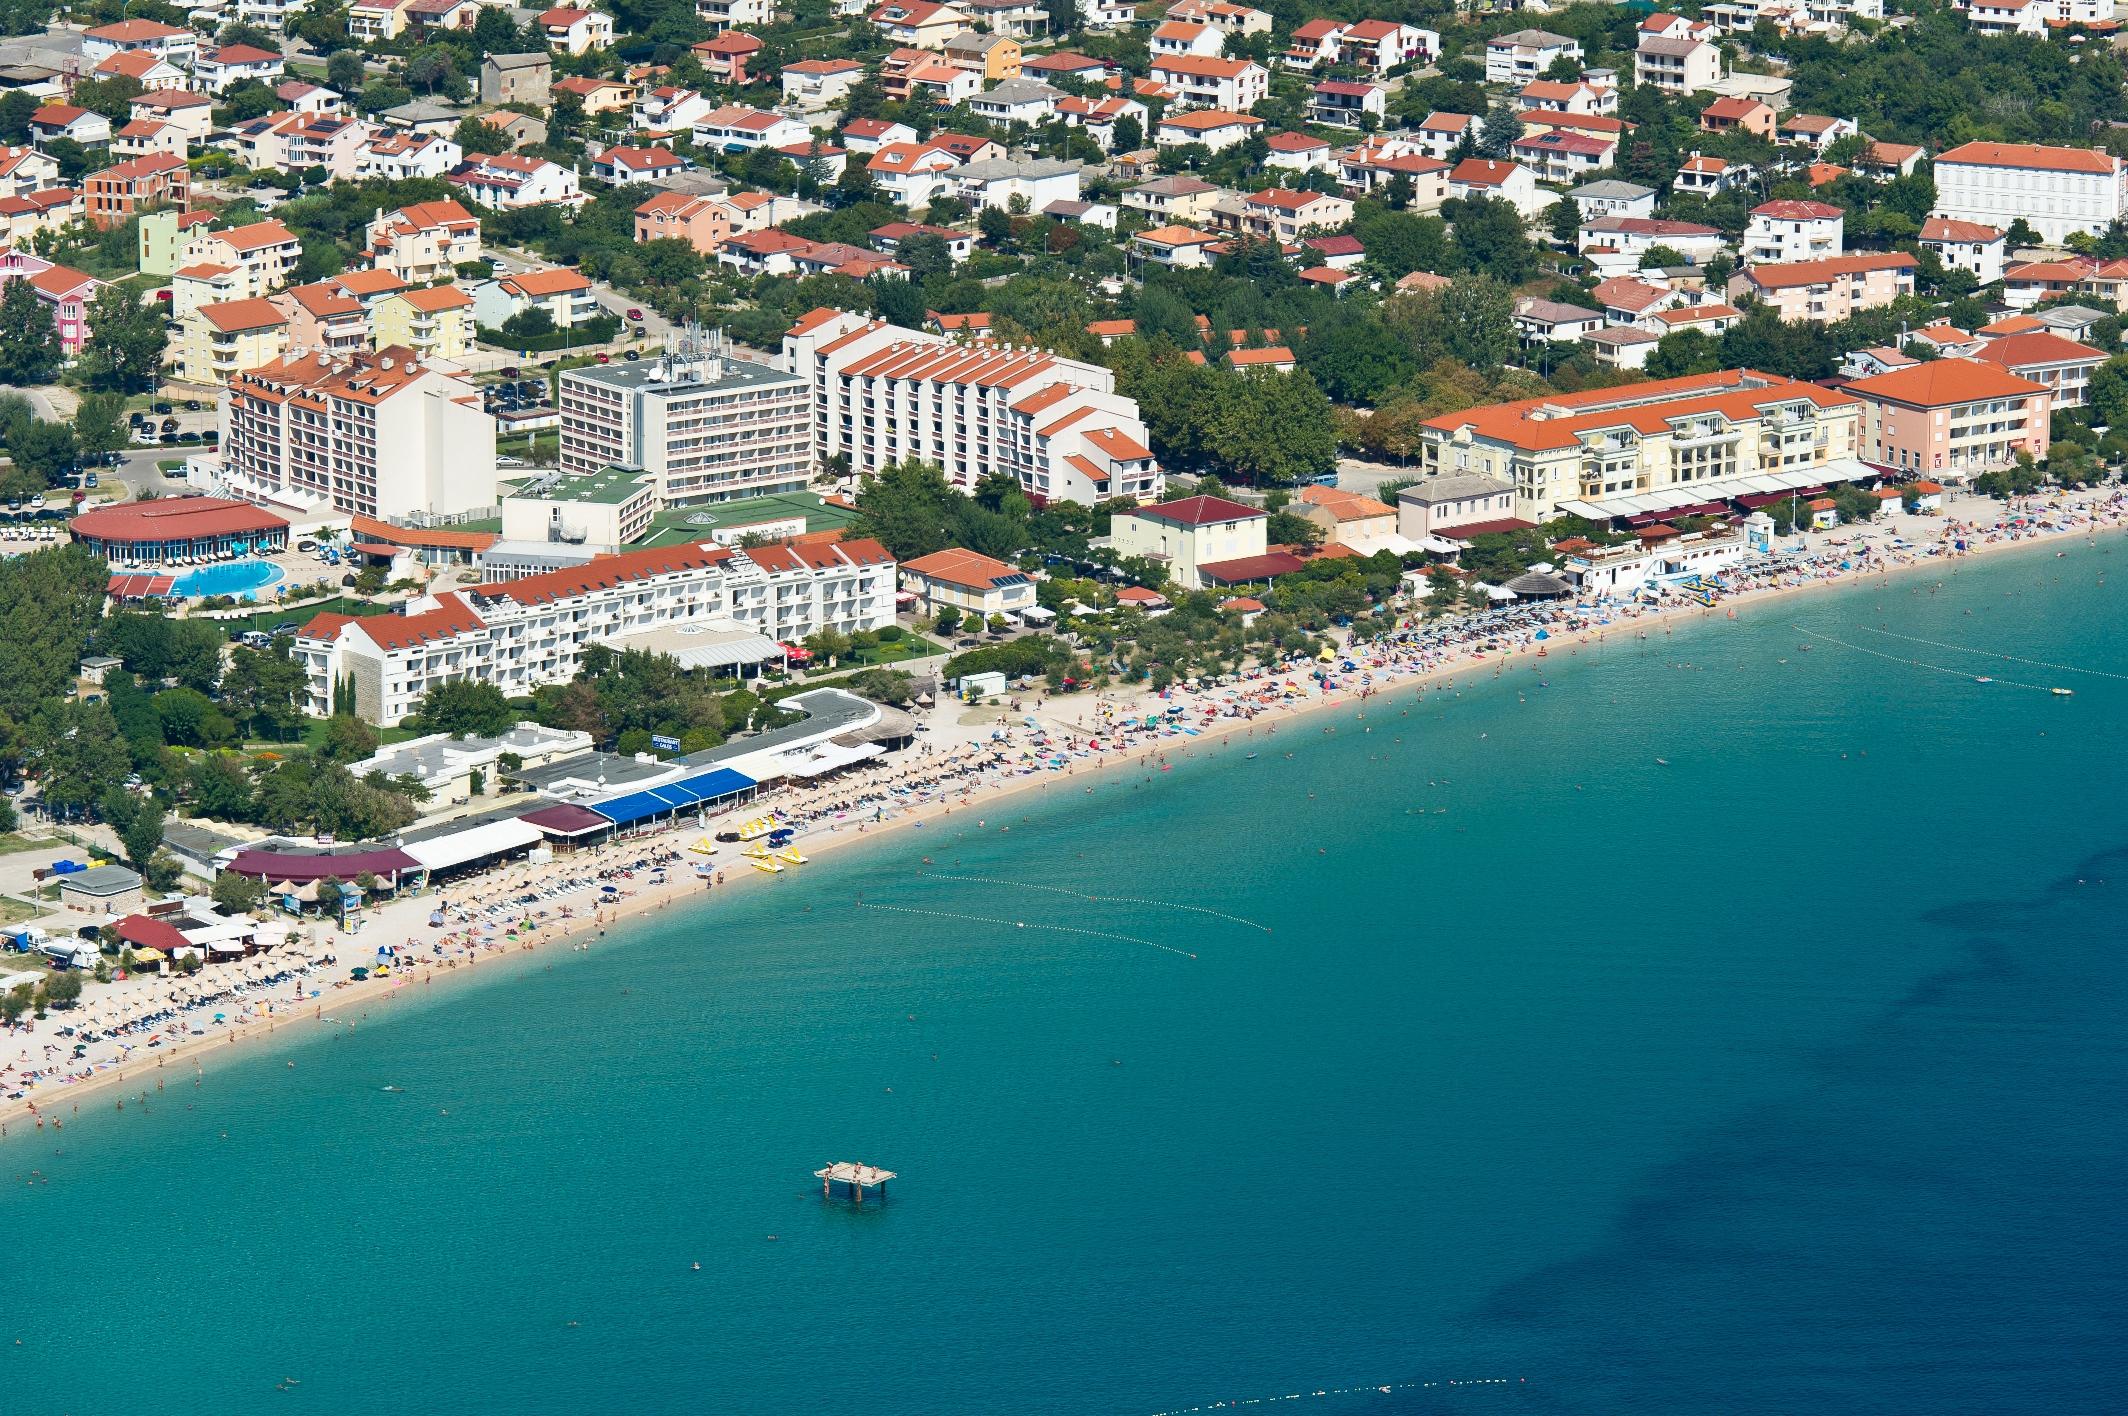 Hotel_Corinthia_-_Baška_4